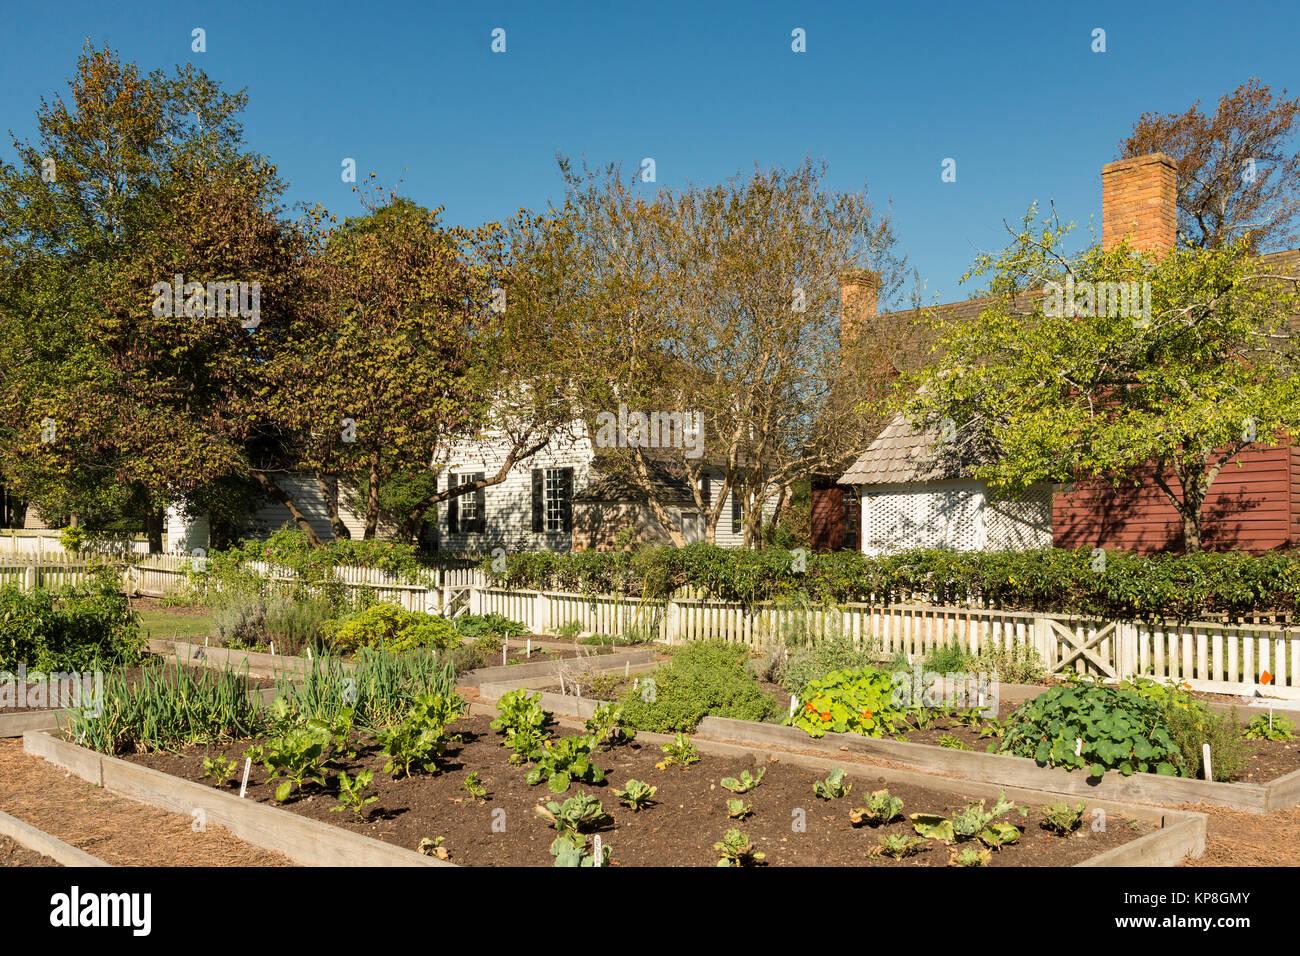 Colonial Williamsburg Garden Behind Homes Along Duke Of Gloucester Street